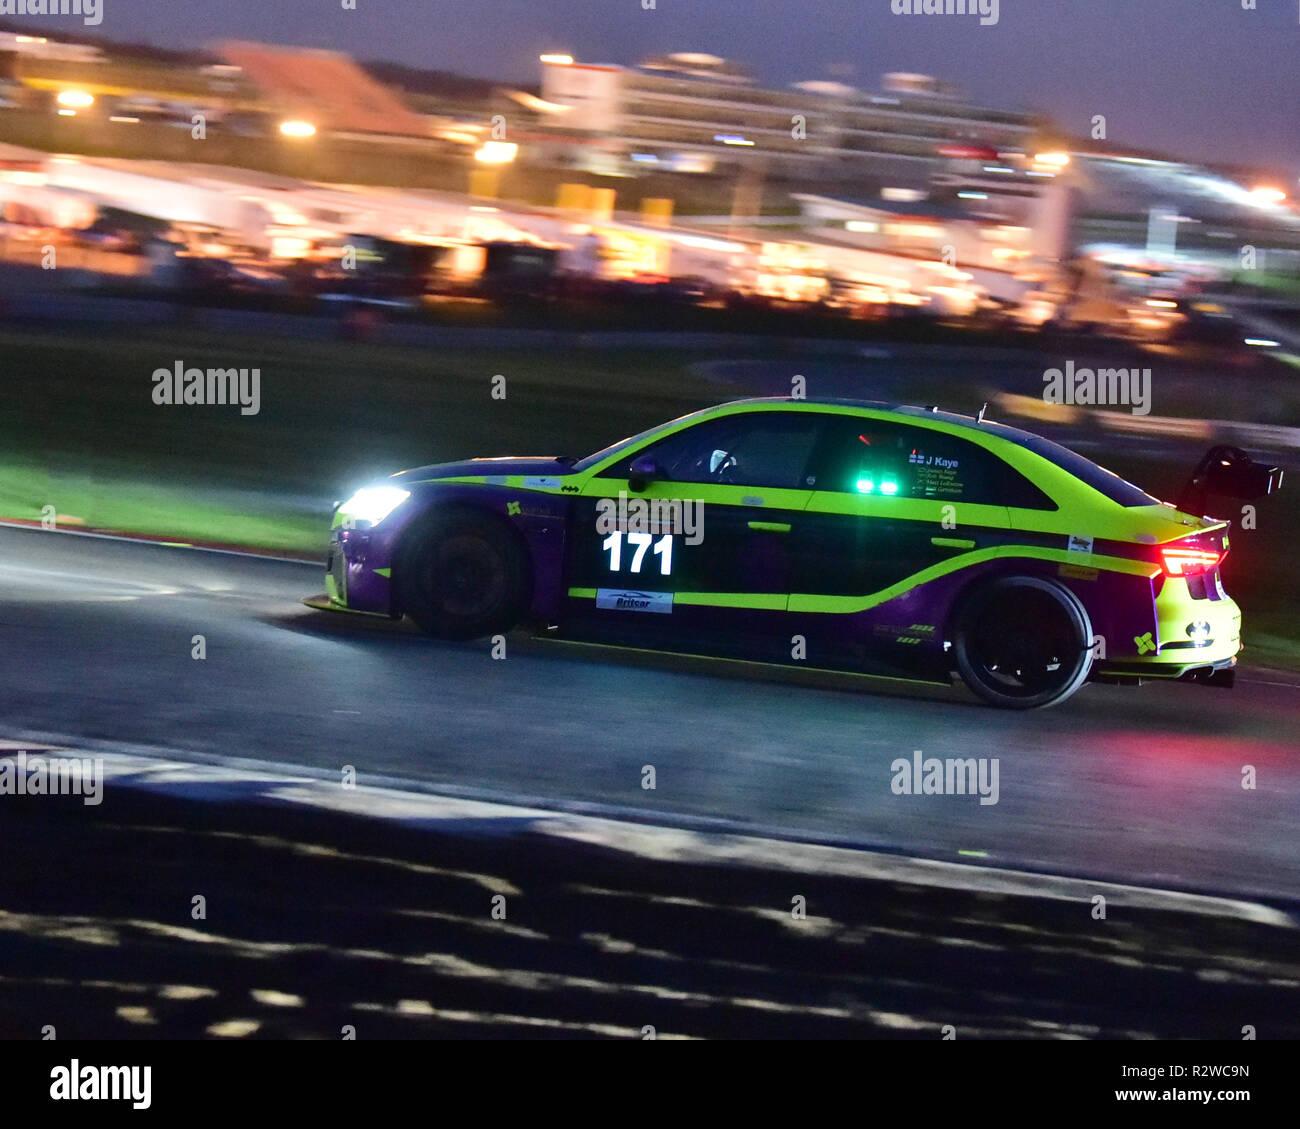 Matt Le Breton James Kaye Audi Rs3 Tcr Gara Notturna Britcar